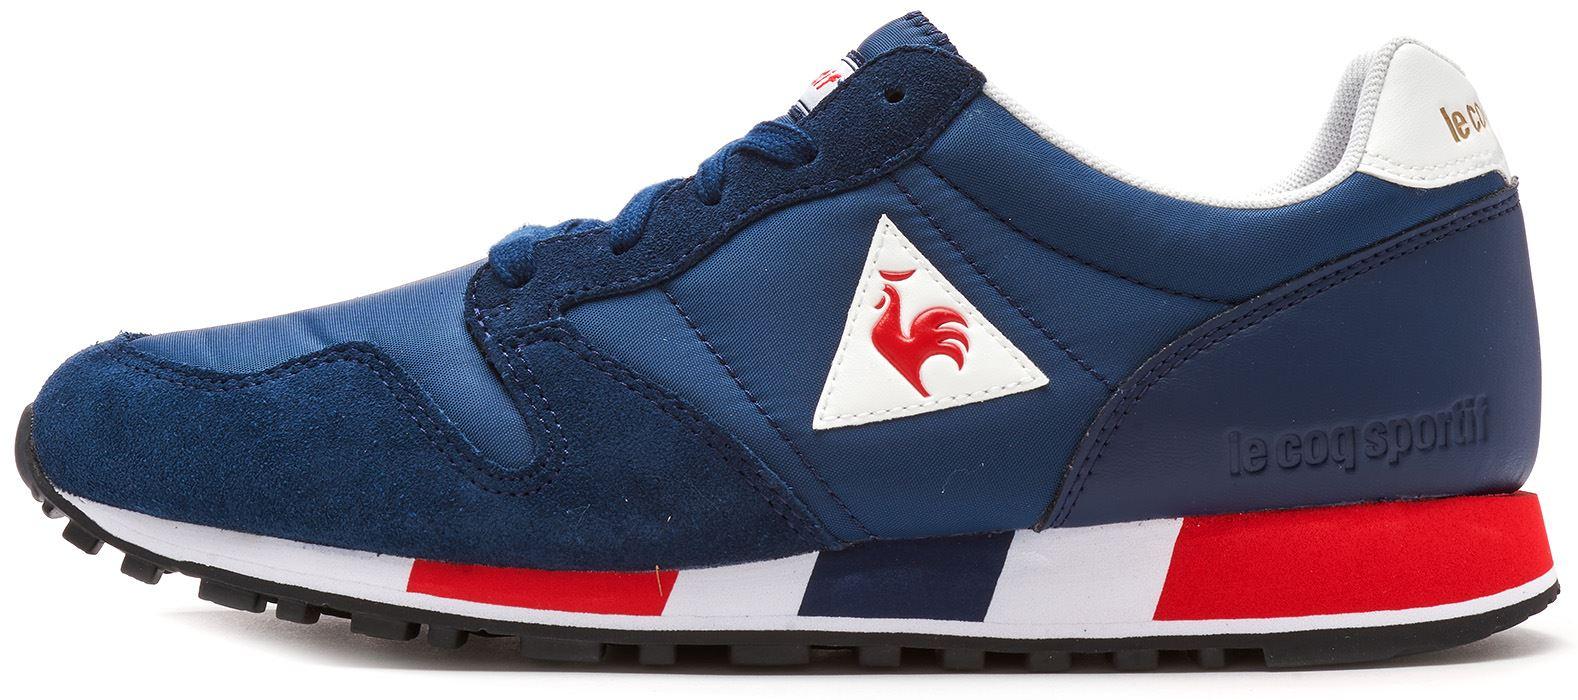 2f5a60ea Le Coq Sportif Omega X Sport & Nylon Trainers in Blue & Grey 181F079 ...